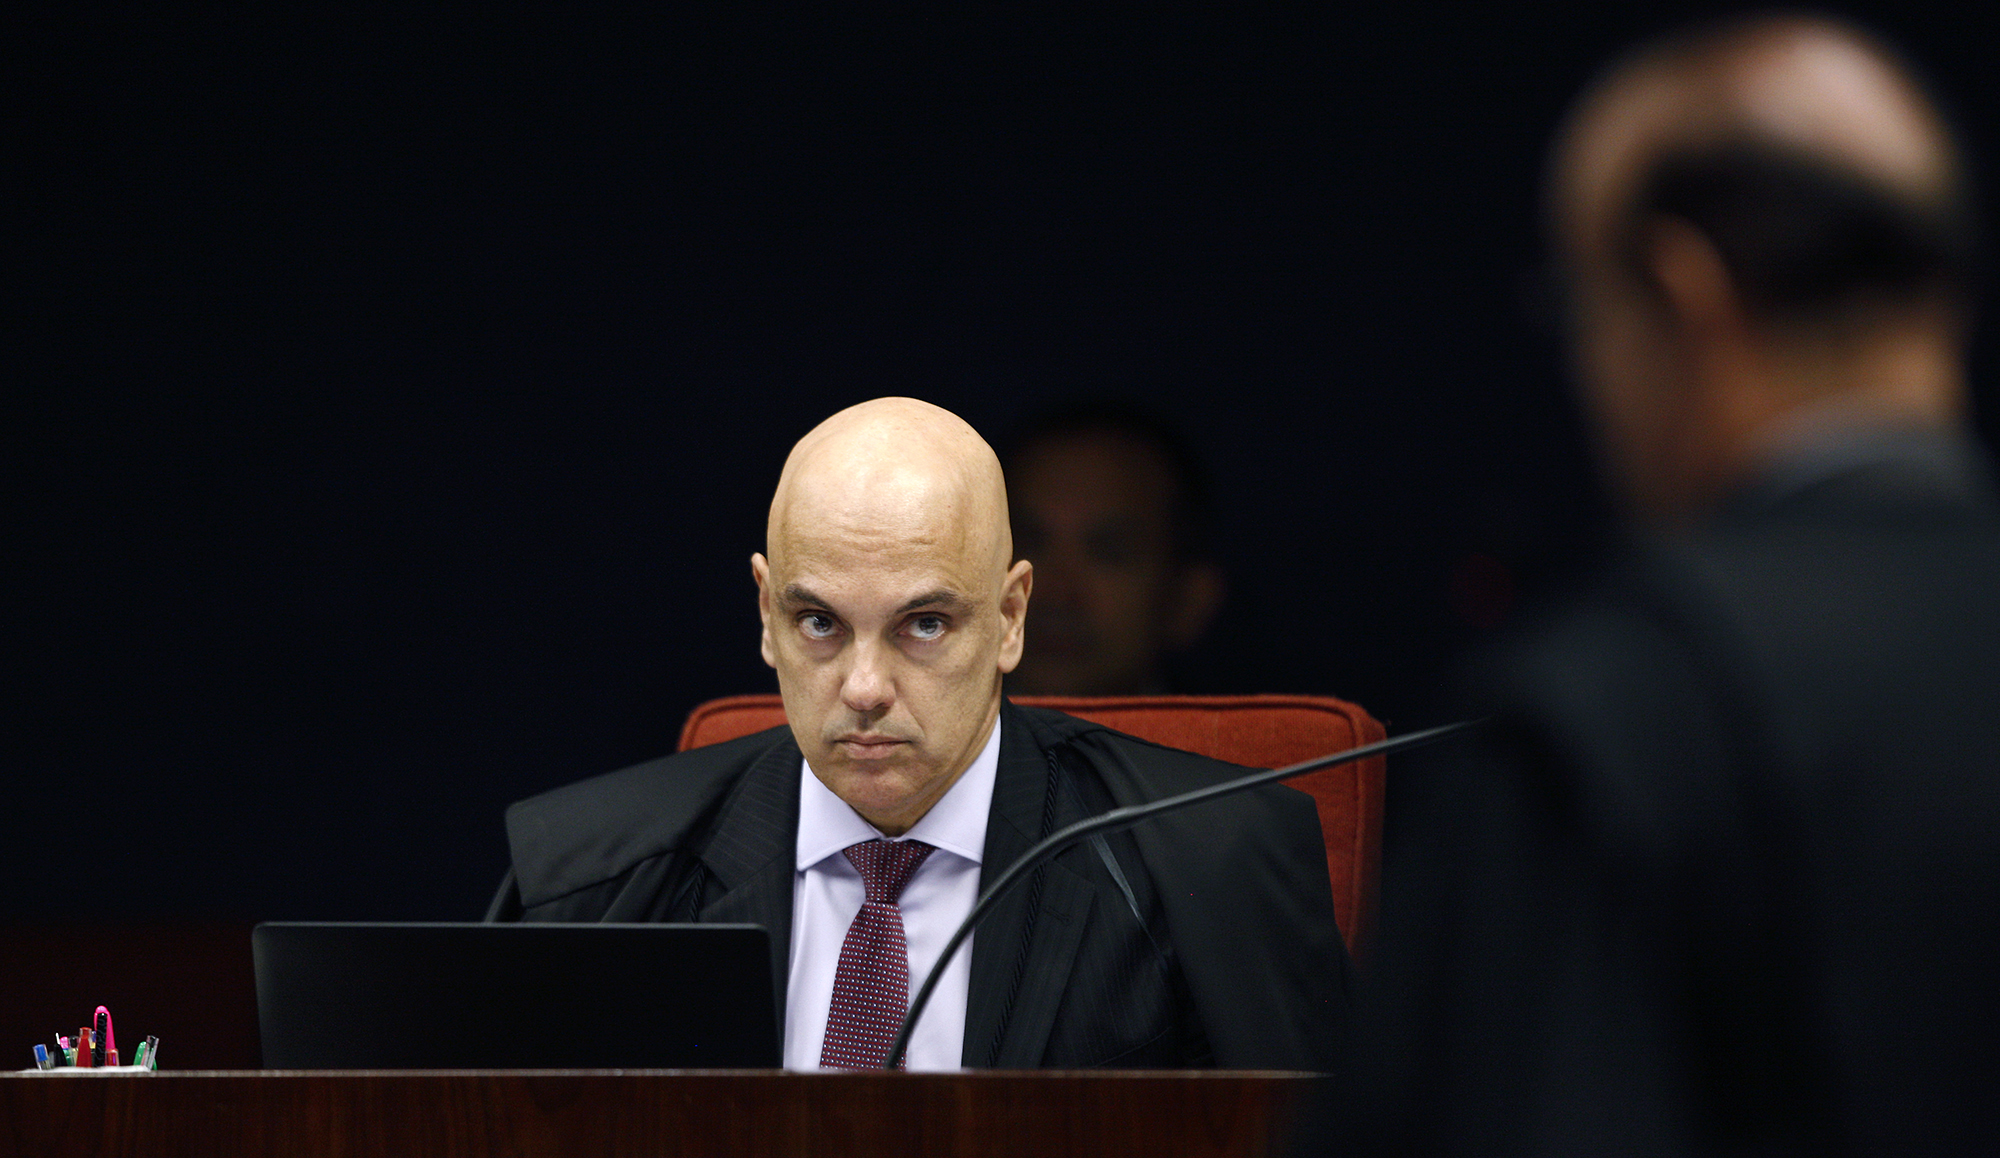 Moraes prorroga inquéritos das fake news e dos atos antidemocráticos